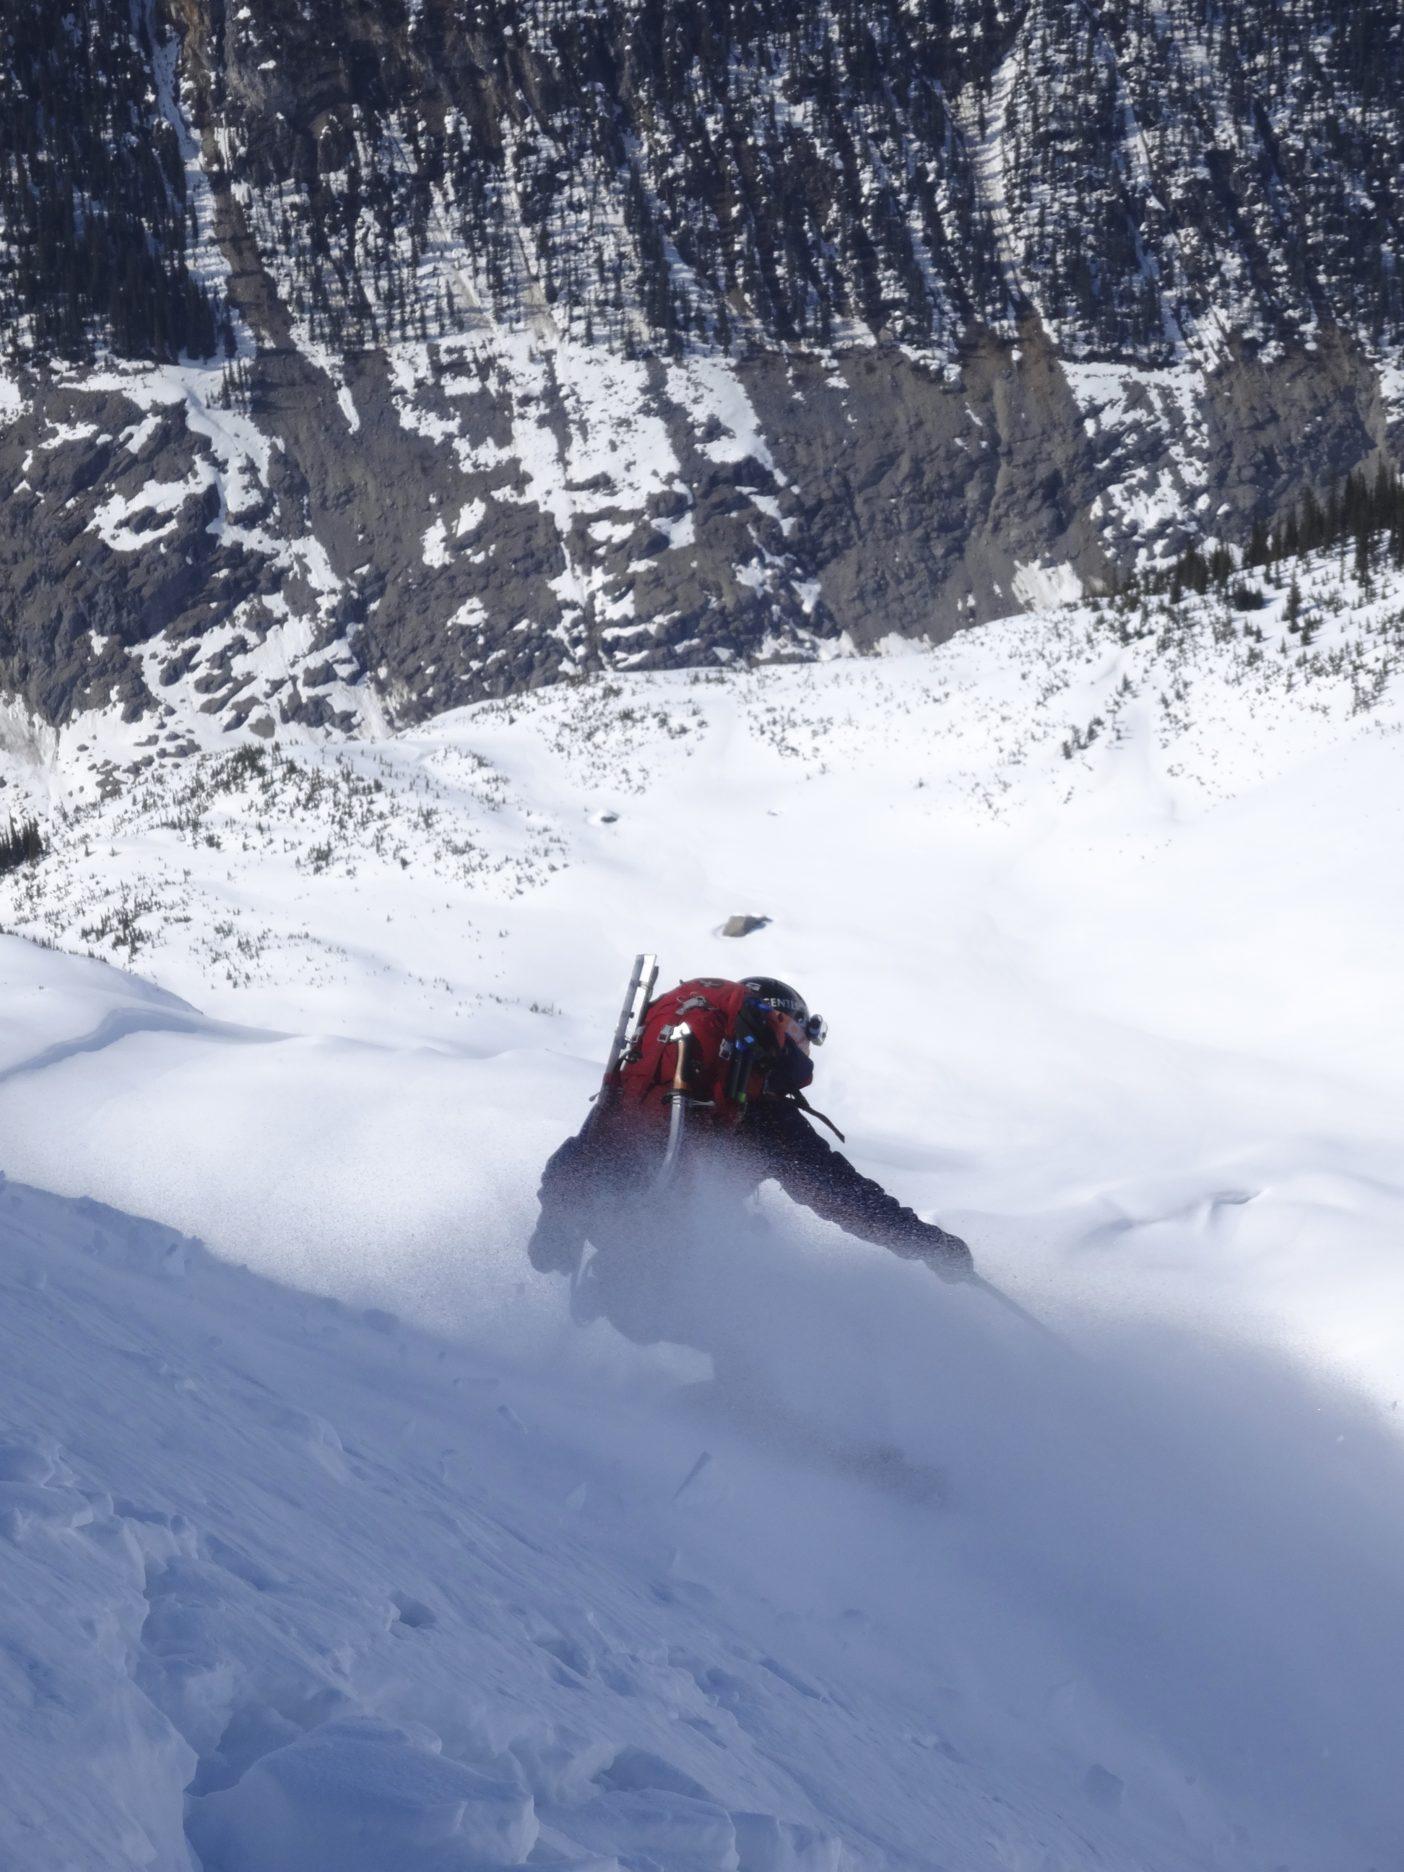 下部雪壁を滑る加藤。写真:山木匡浩